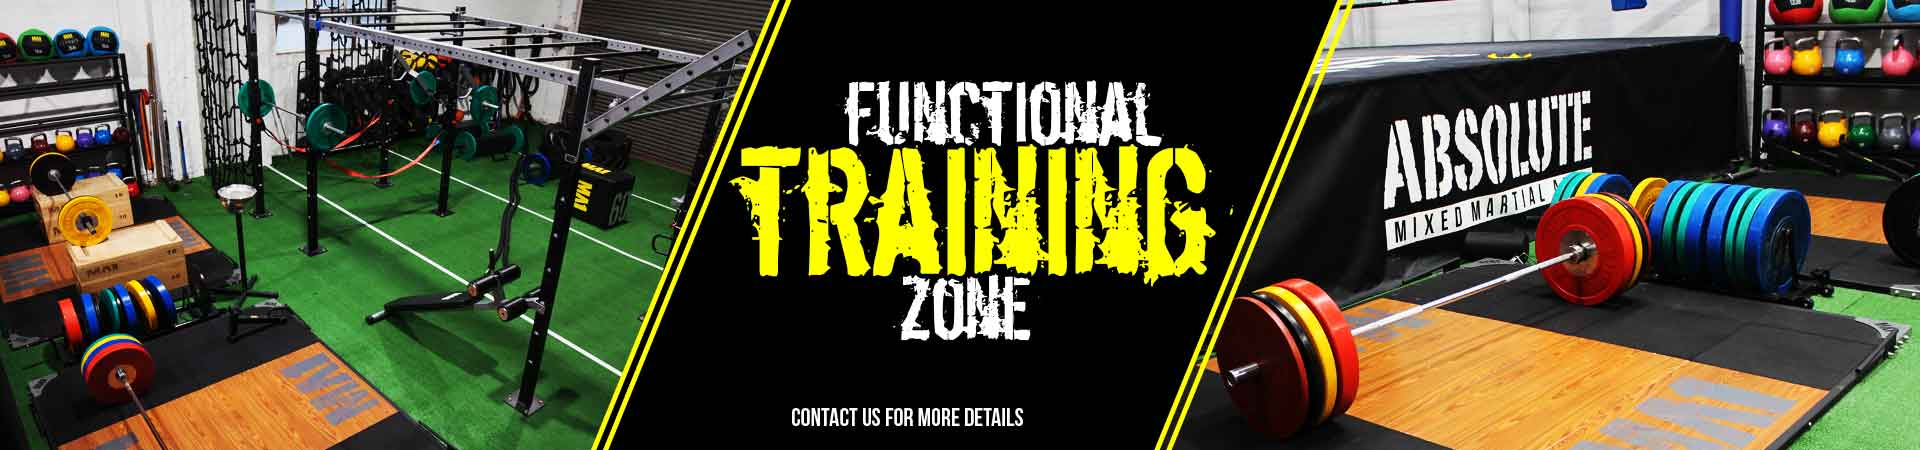 MA1 Functional Training Zone